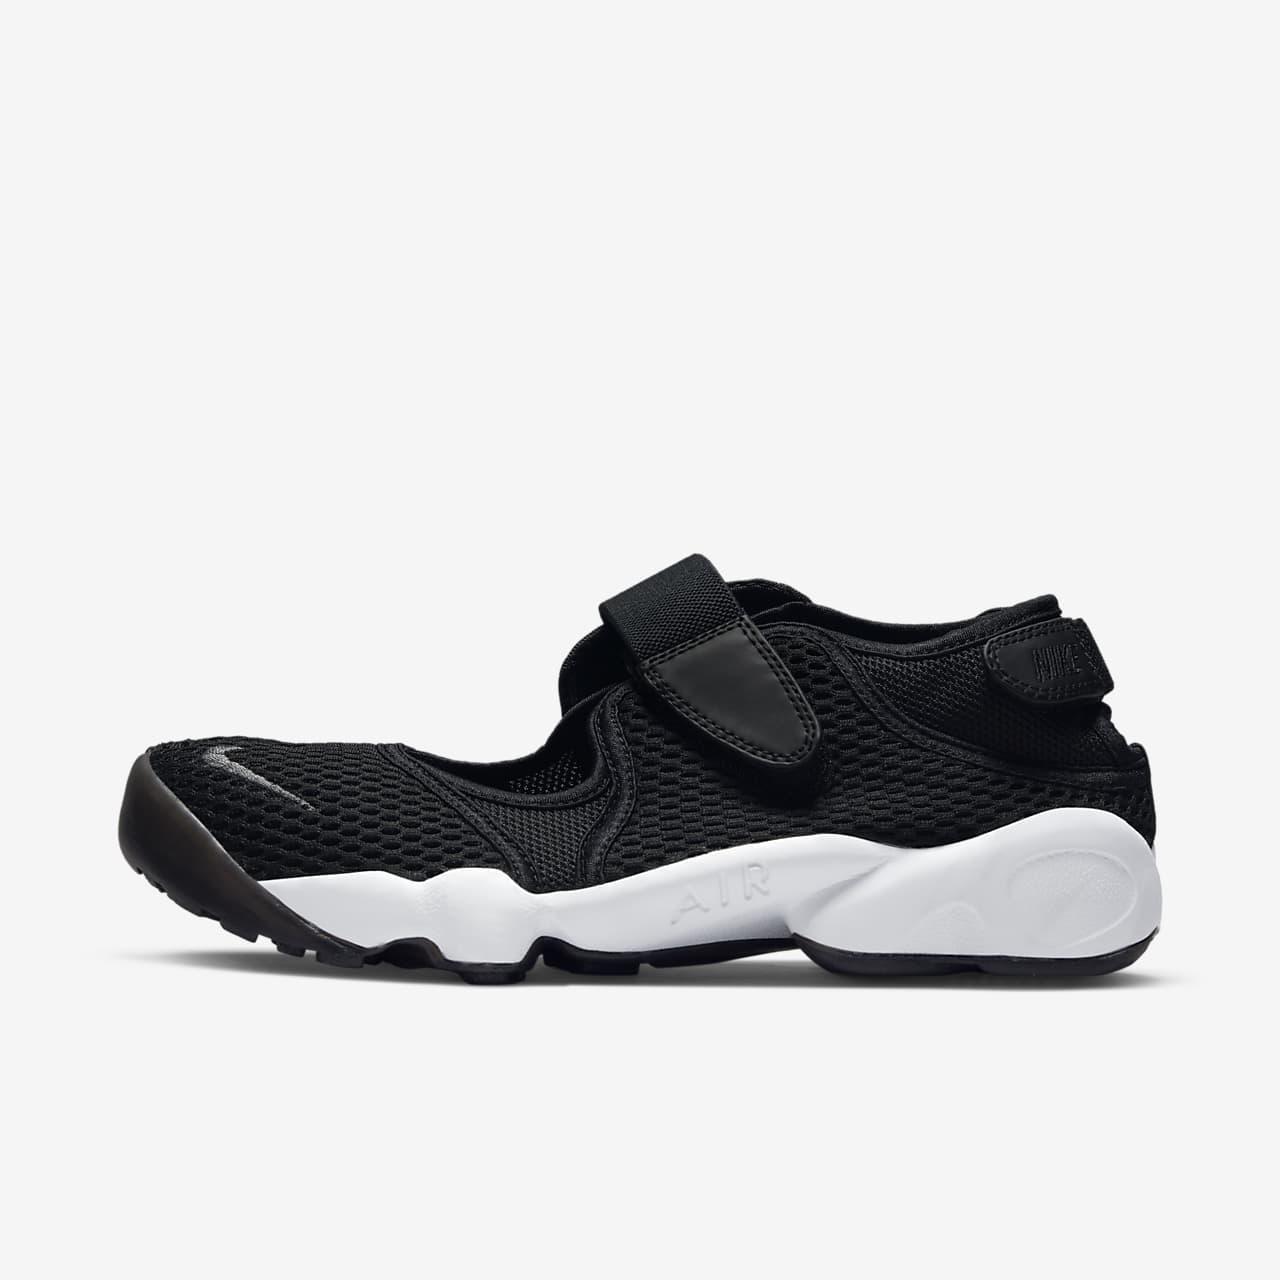 Nike Air Rift Breathe Women's Shoe